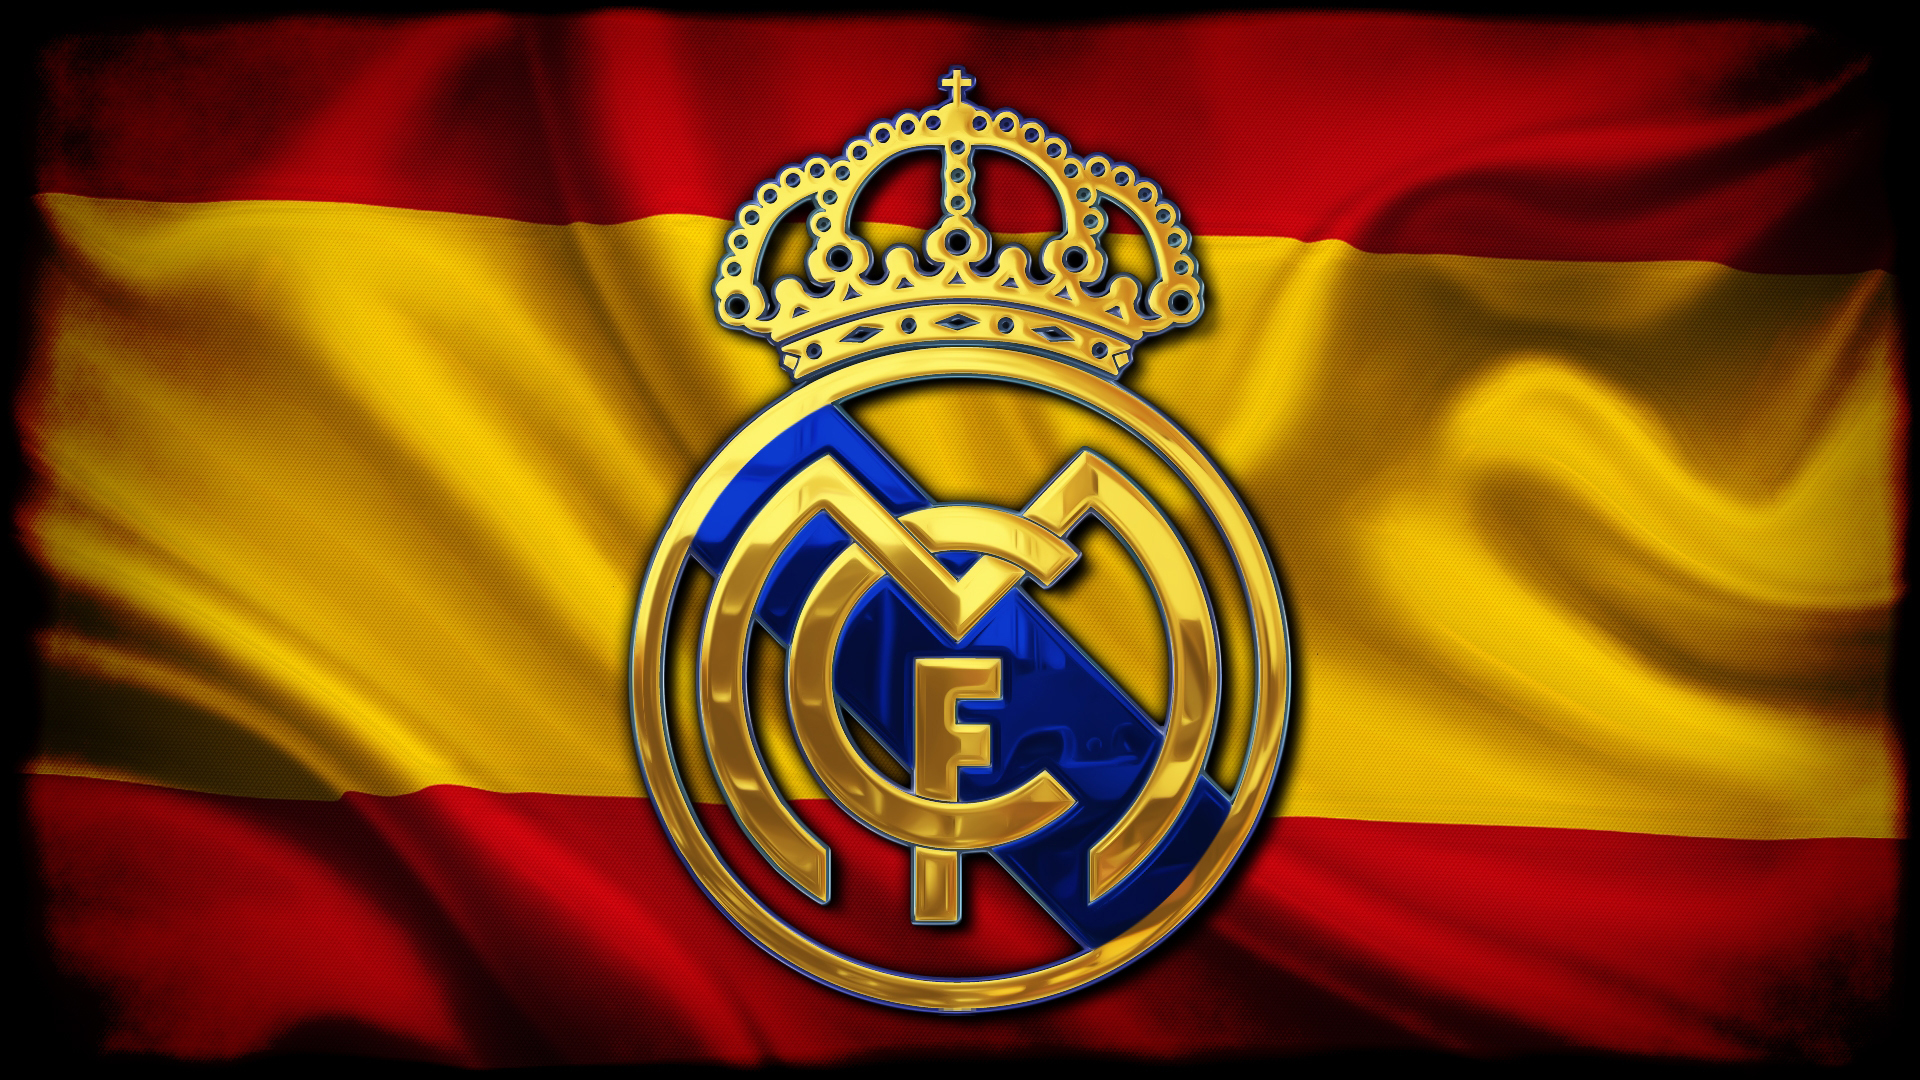 Fondos de pantalla Logo de Real Madrid en bandera de España